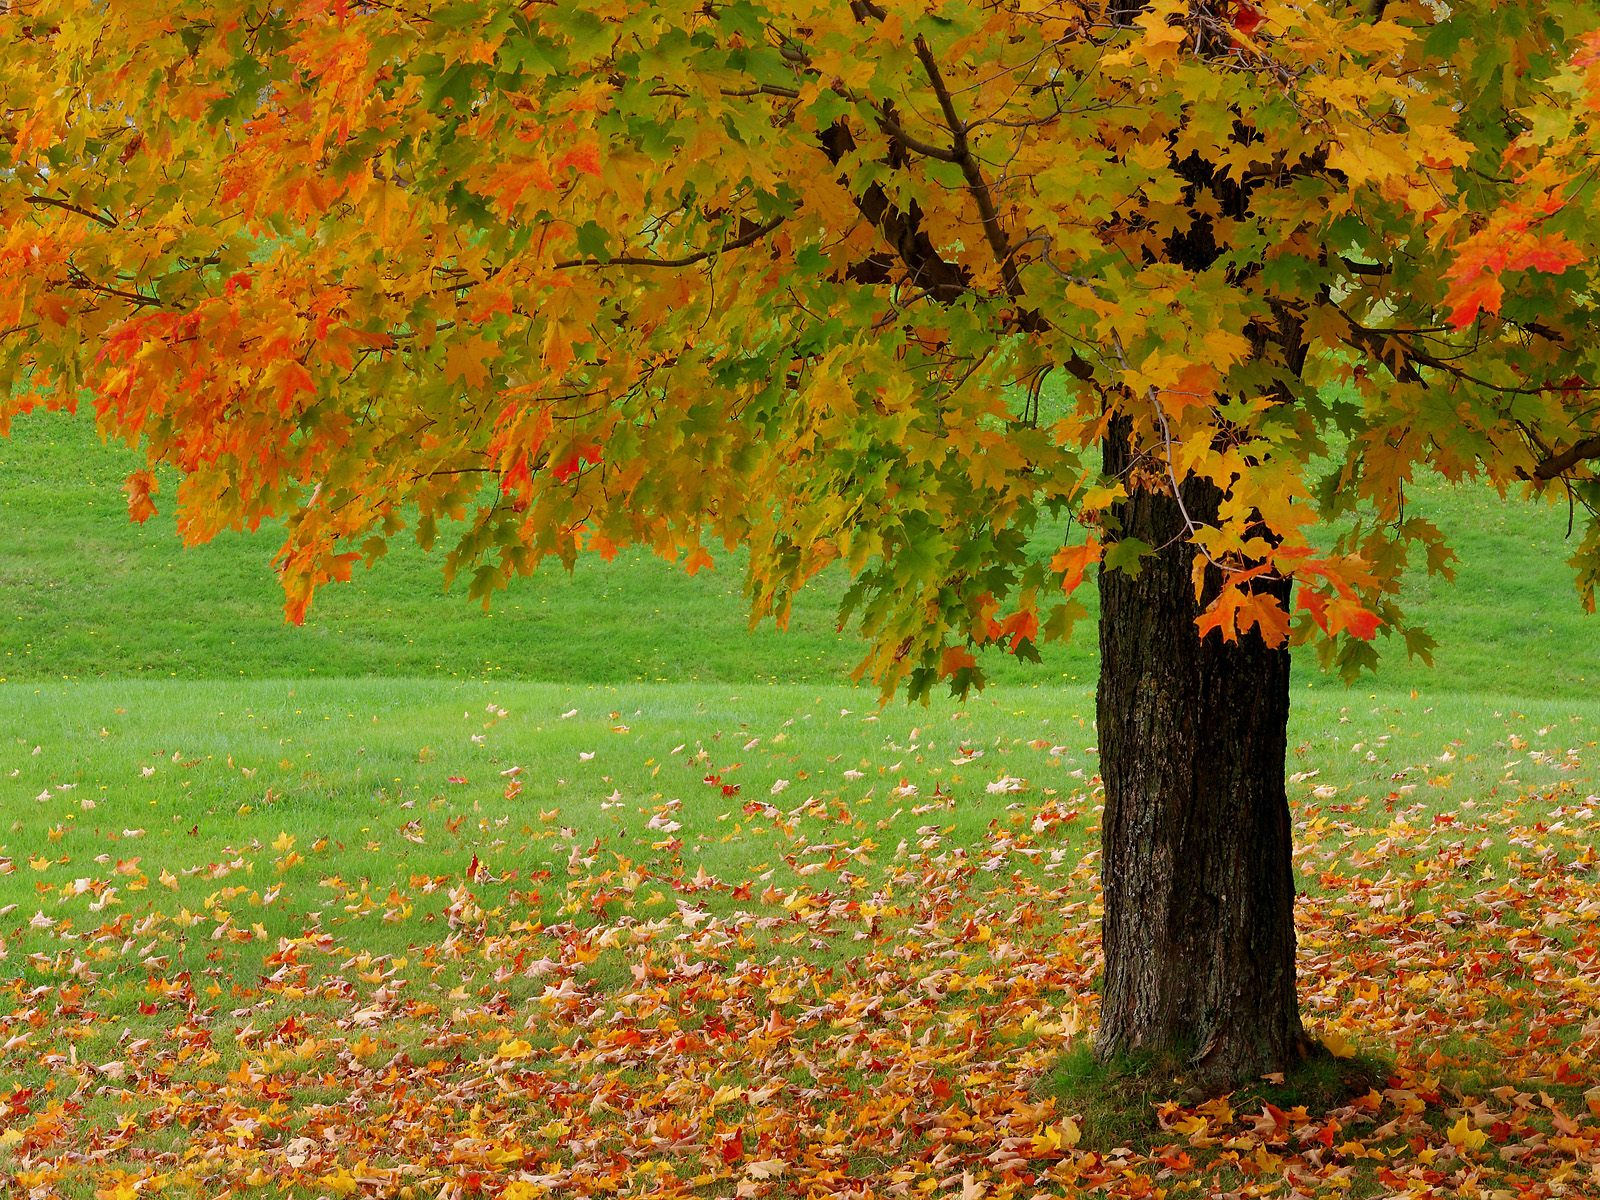 autumn season wallpaper hd beautiful autumn season wallpaper hd 1600x1200